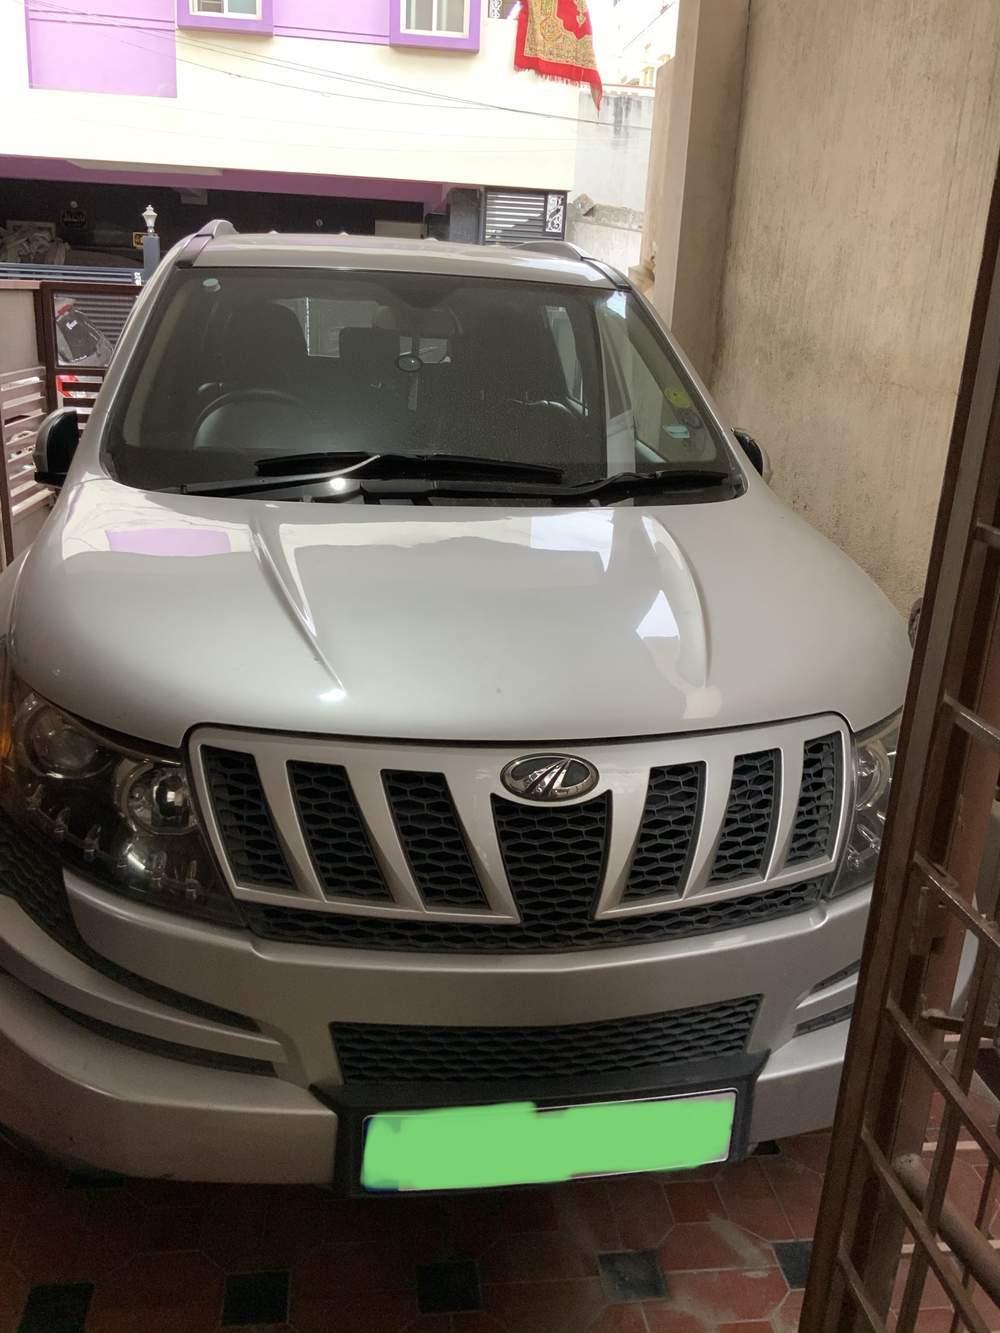 Mahindra Xuv500 Front Left Rim